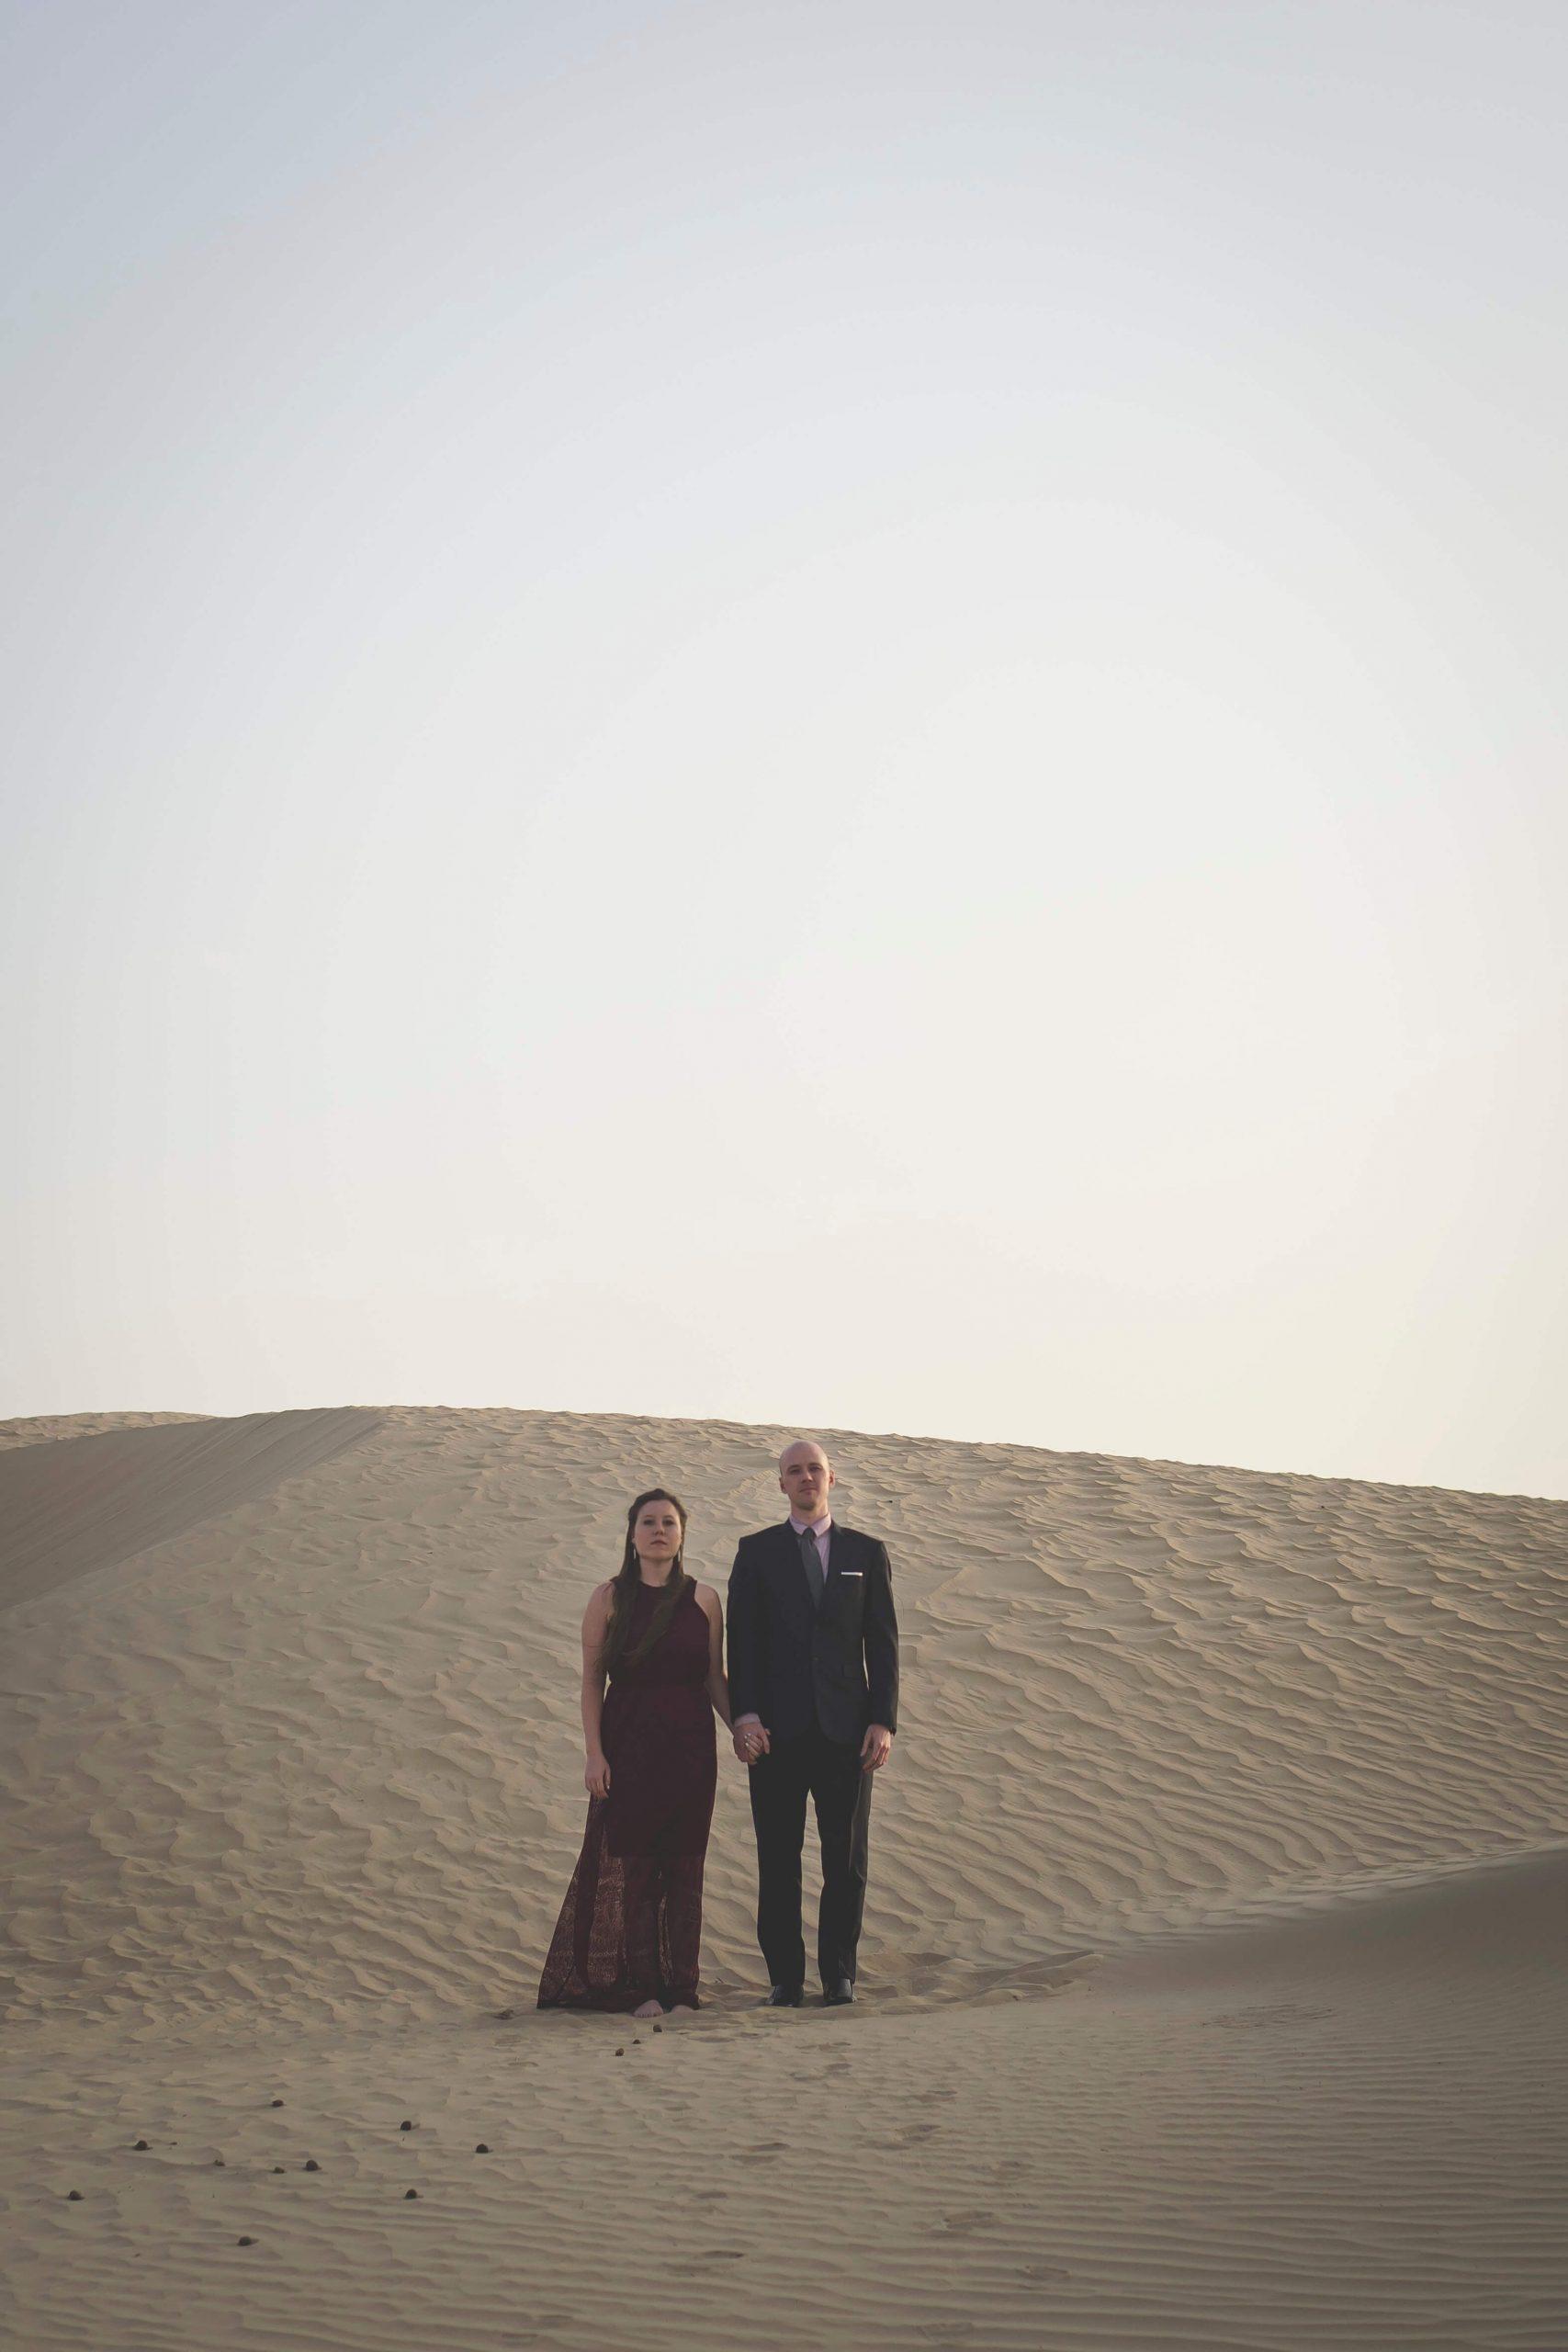 Dan and Di in the Abu Dhabi desert